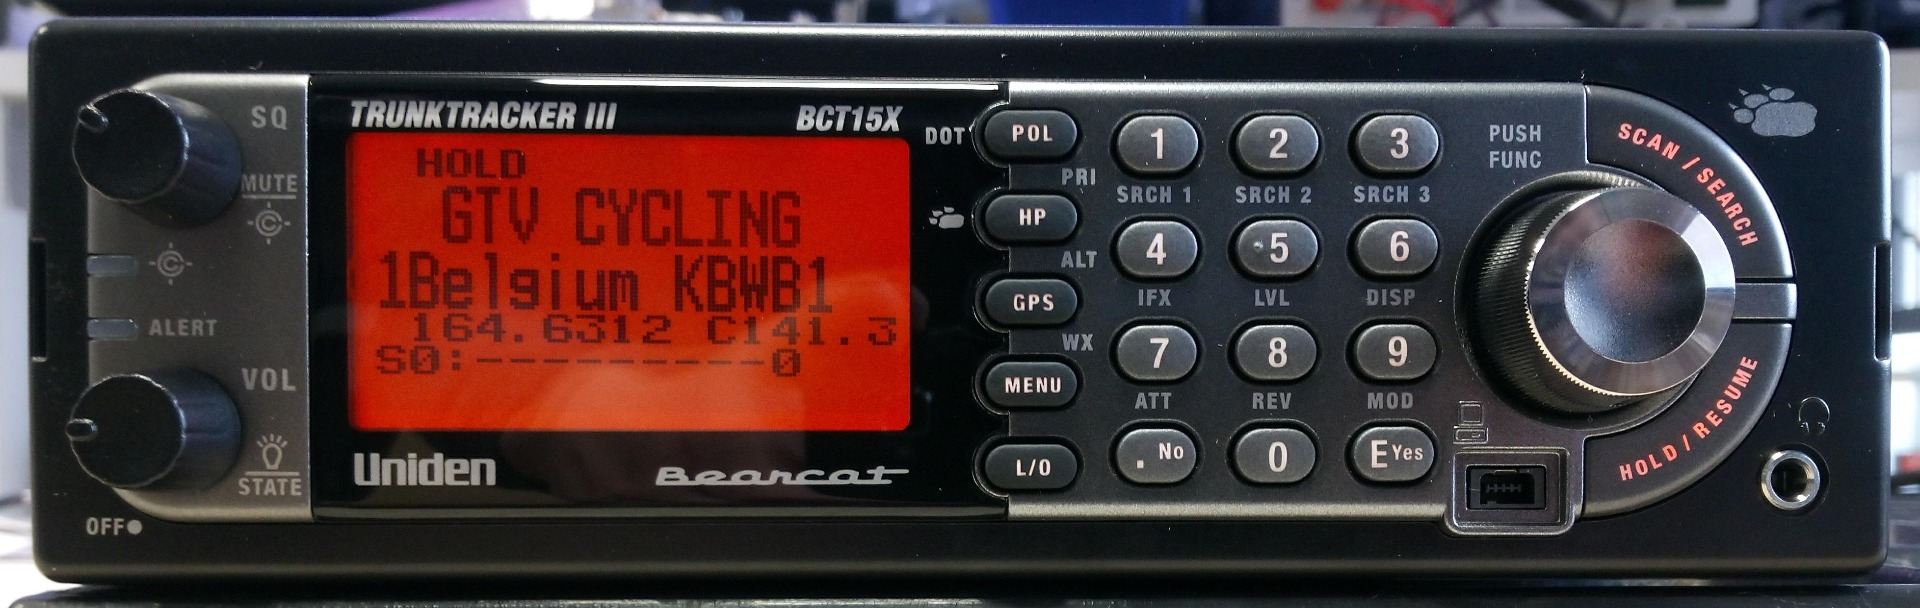 uniden bct15x scanner bearcat ubc radio tour ontvanger